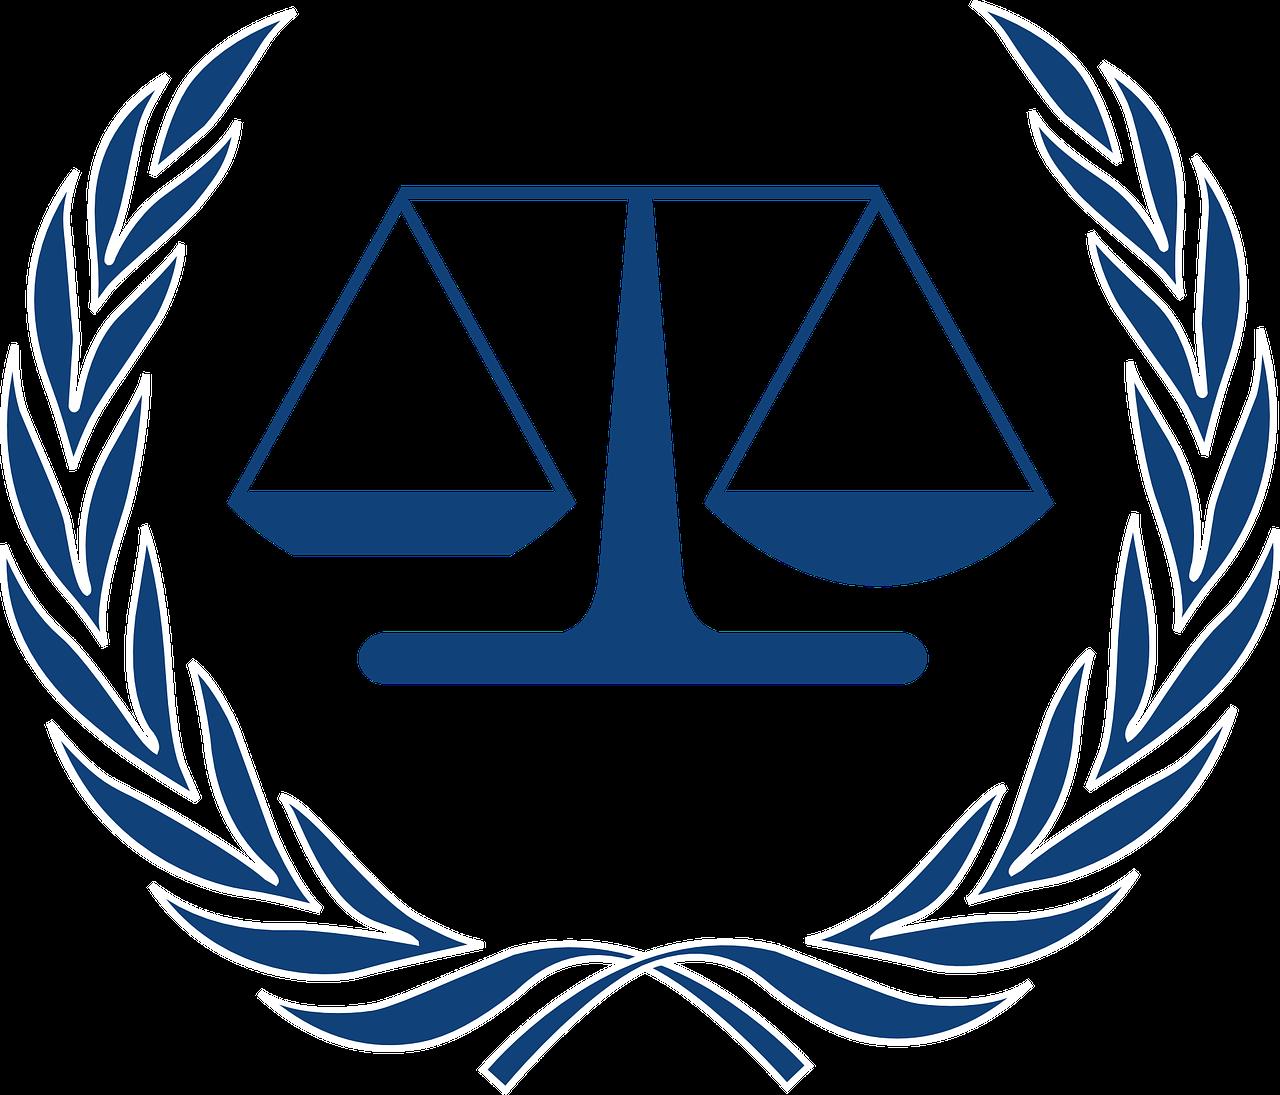 scale, justice, judge